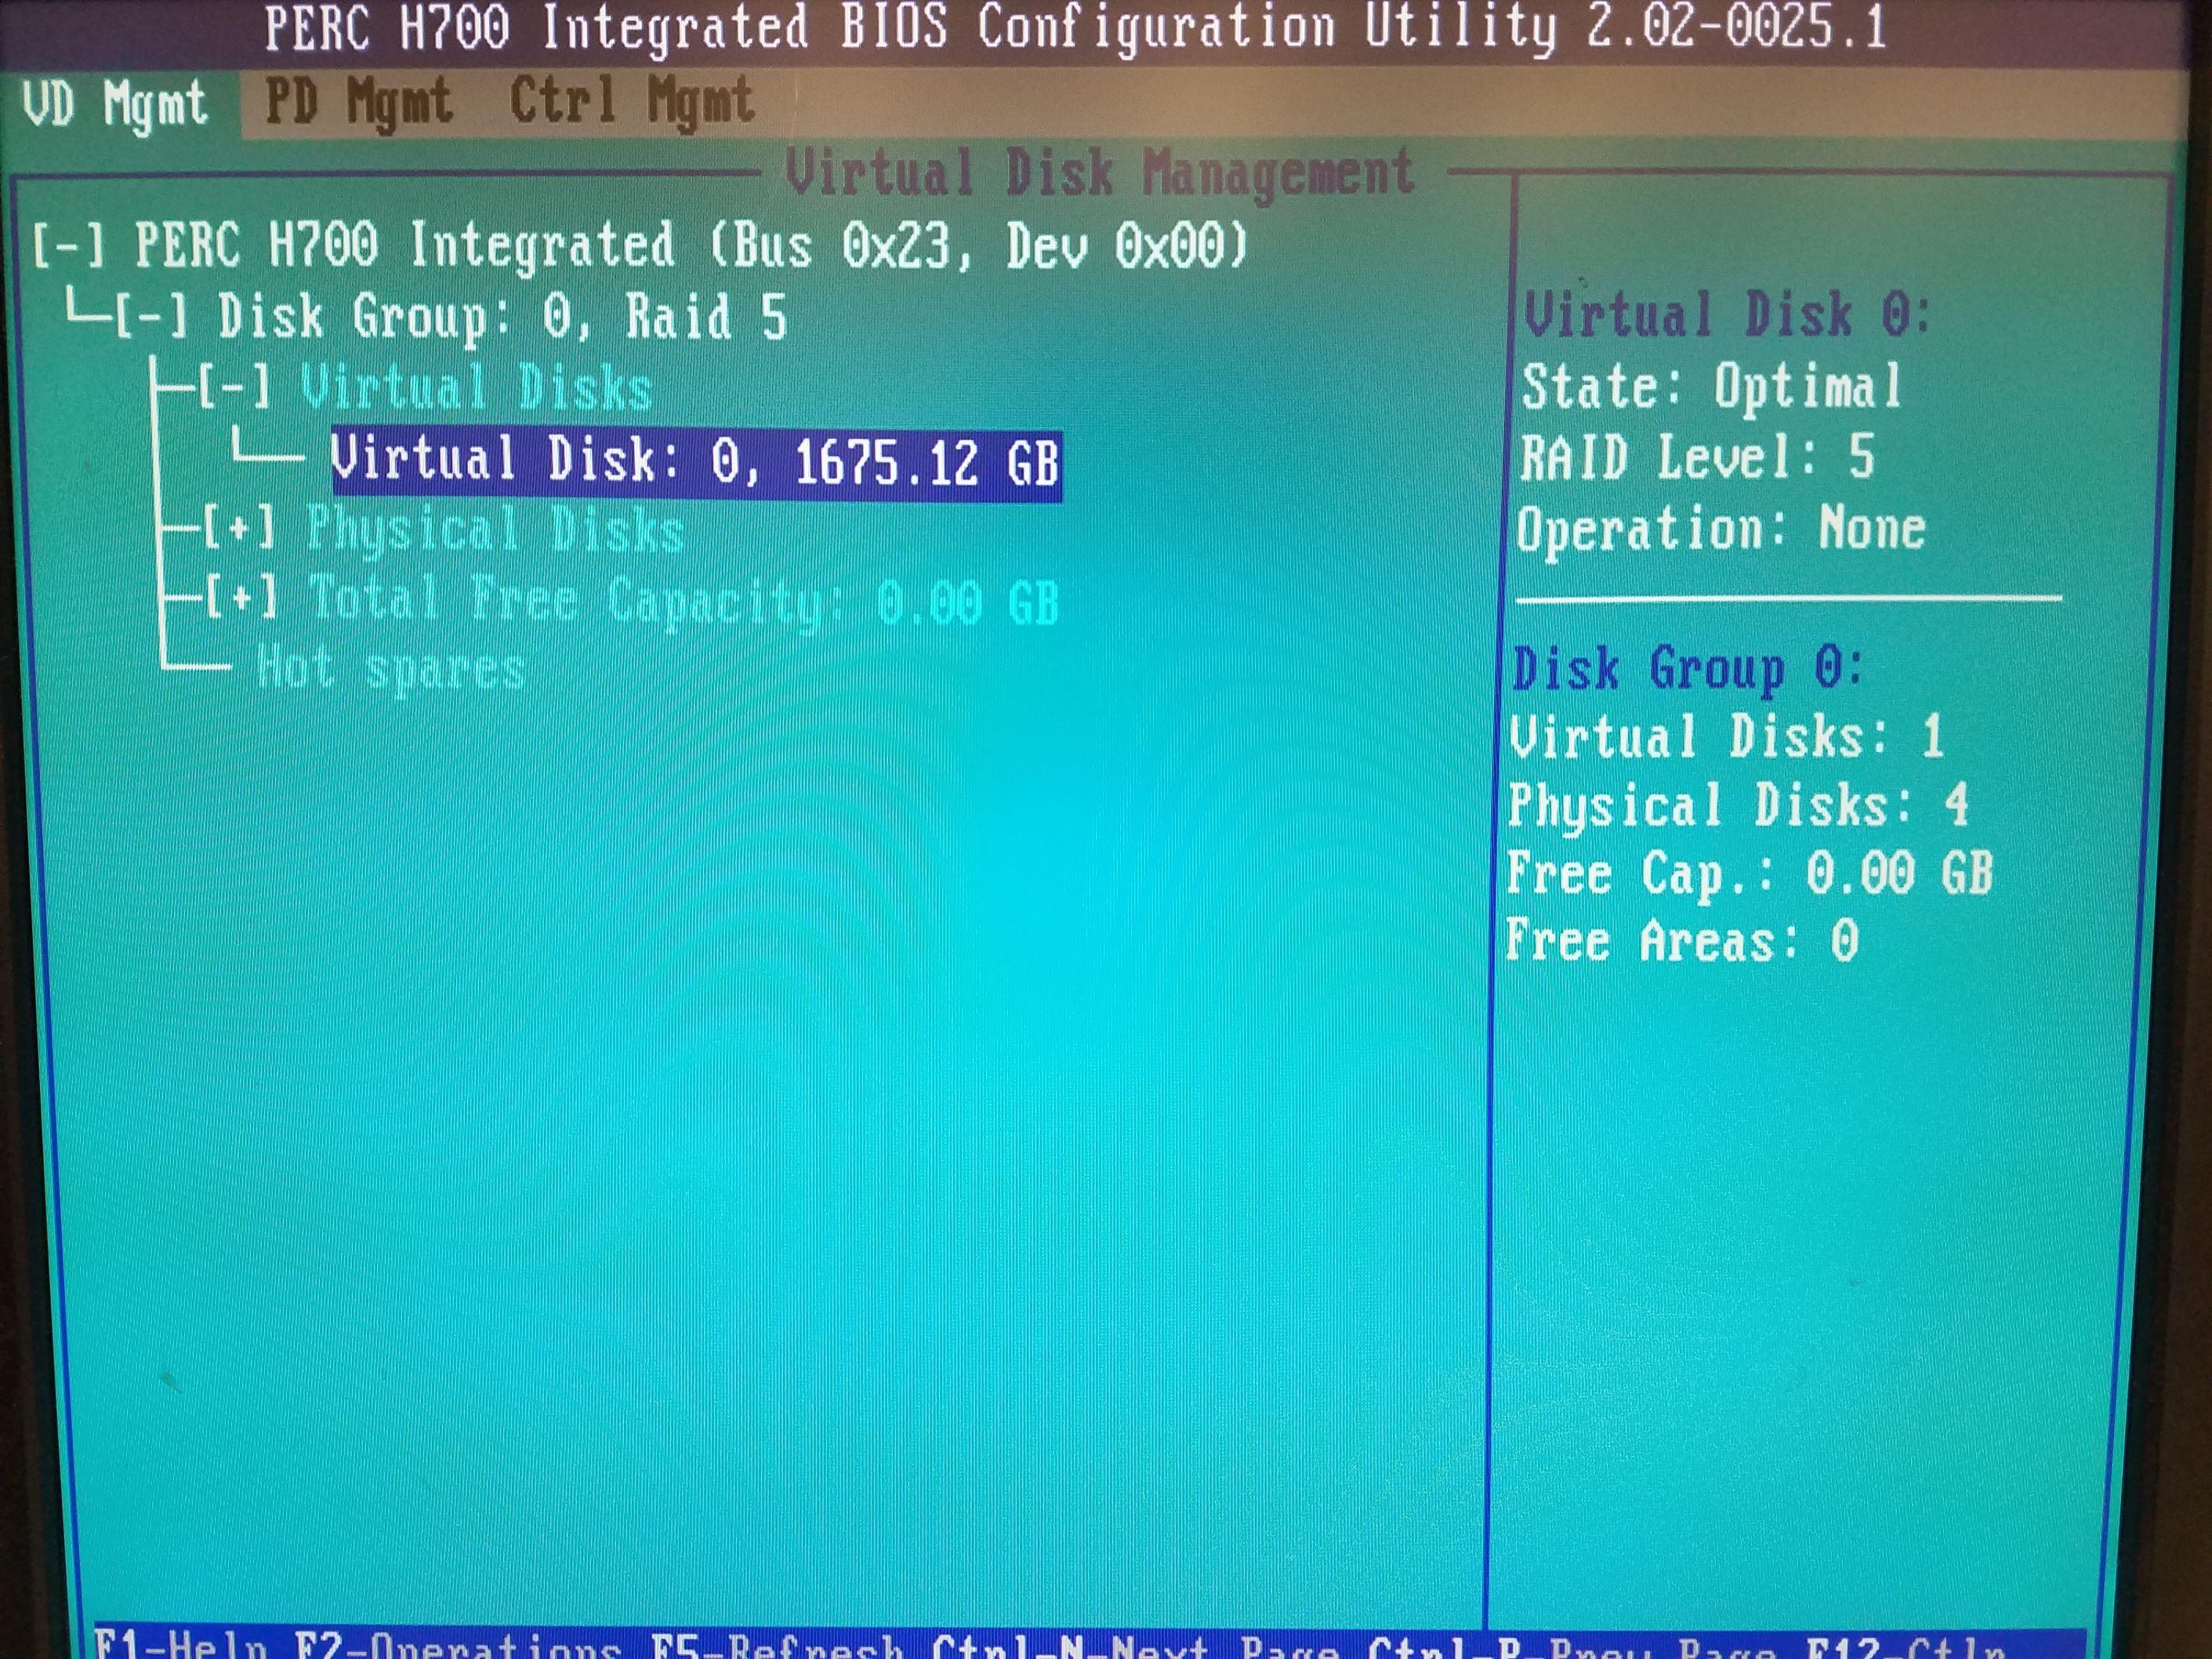 Dell Raid Configuration Utility Windows